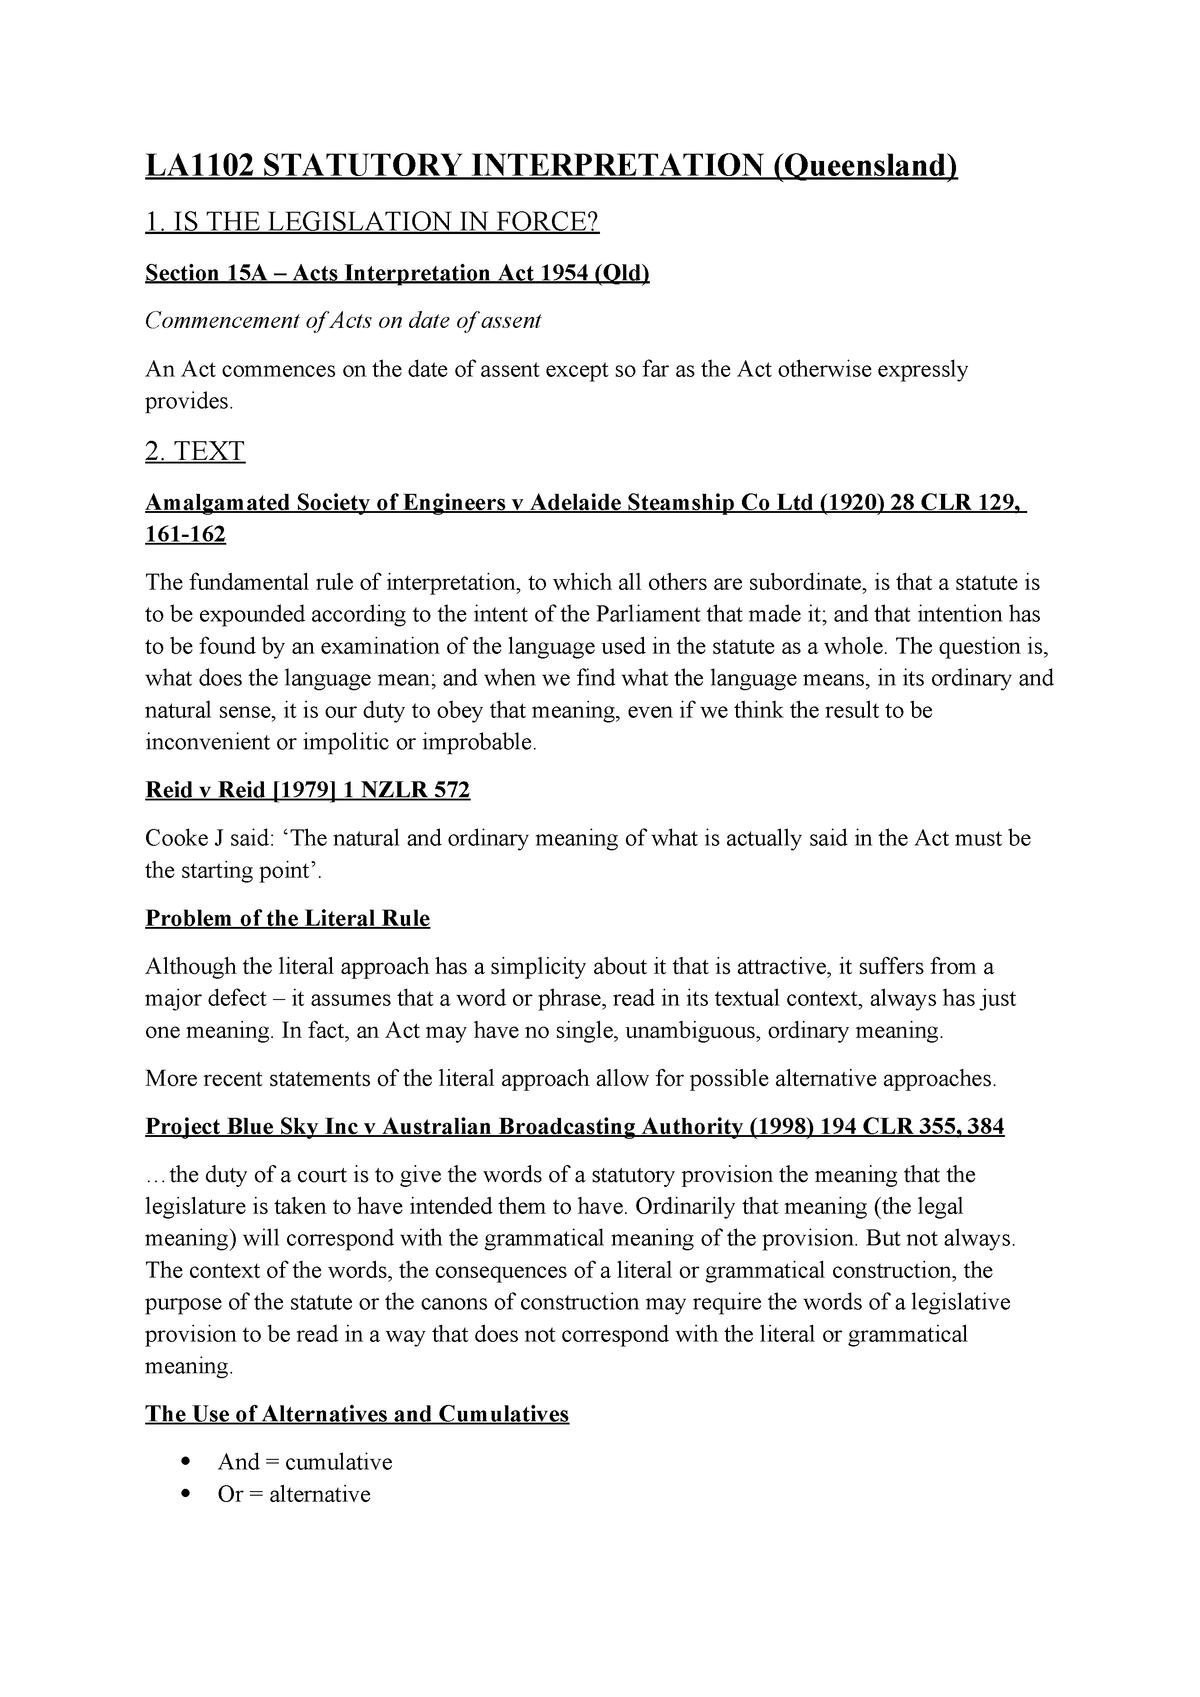 LA1102 Statutory Interpretation (Queensland) (FULL) - JCU